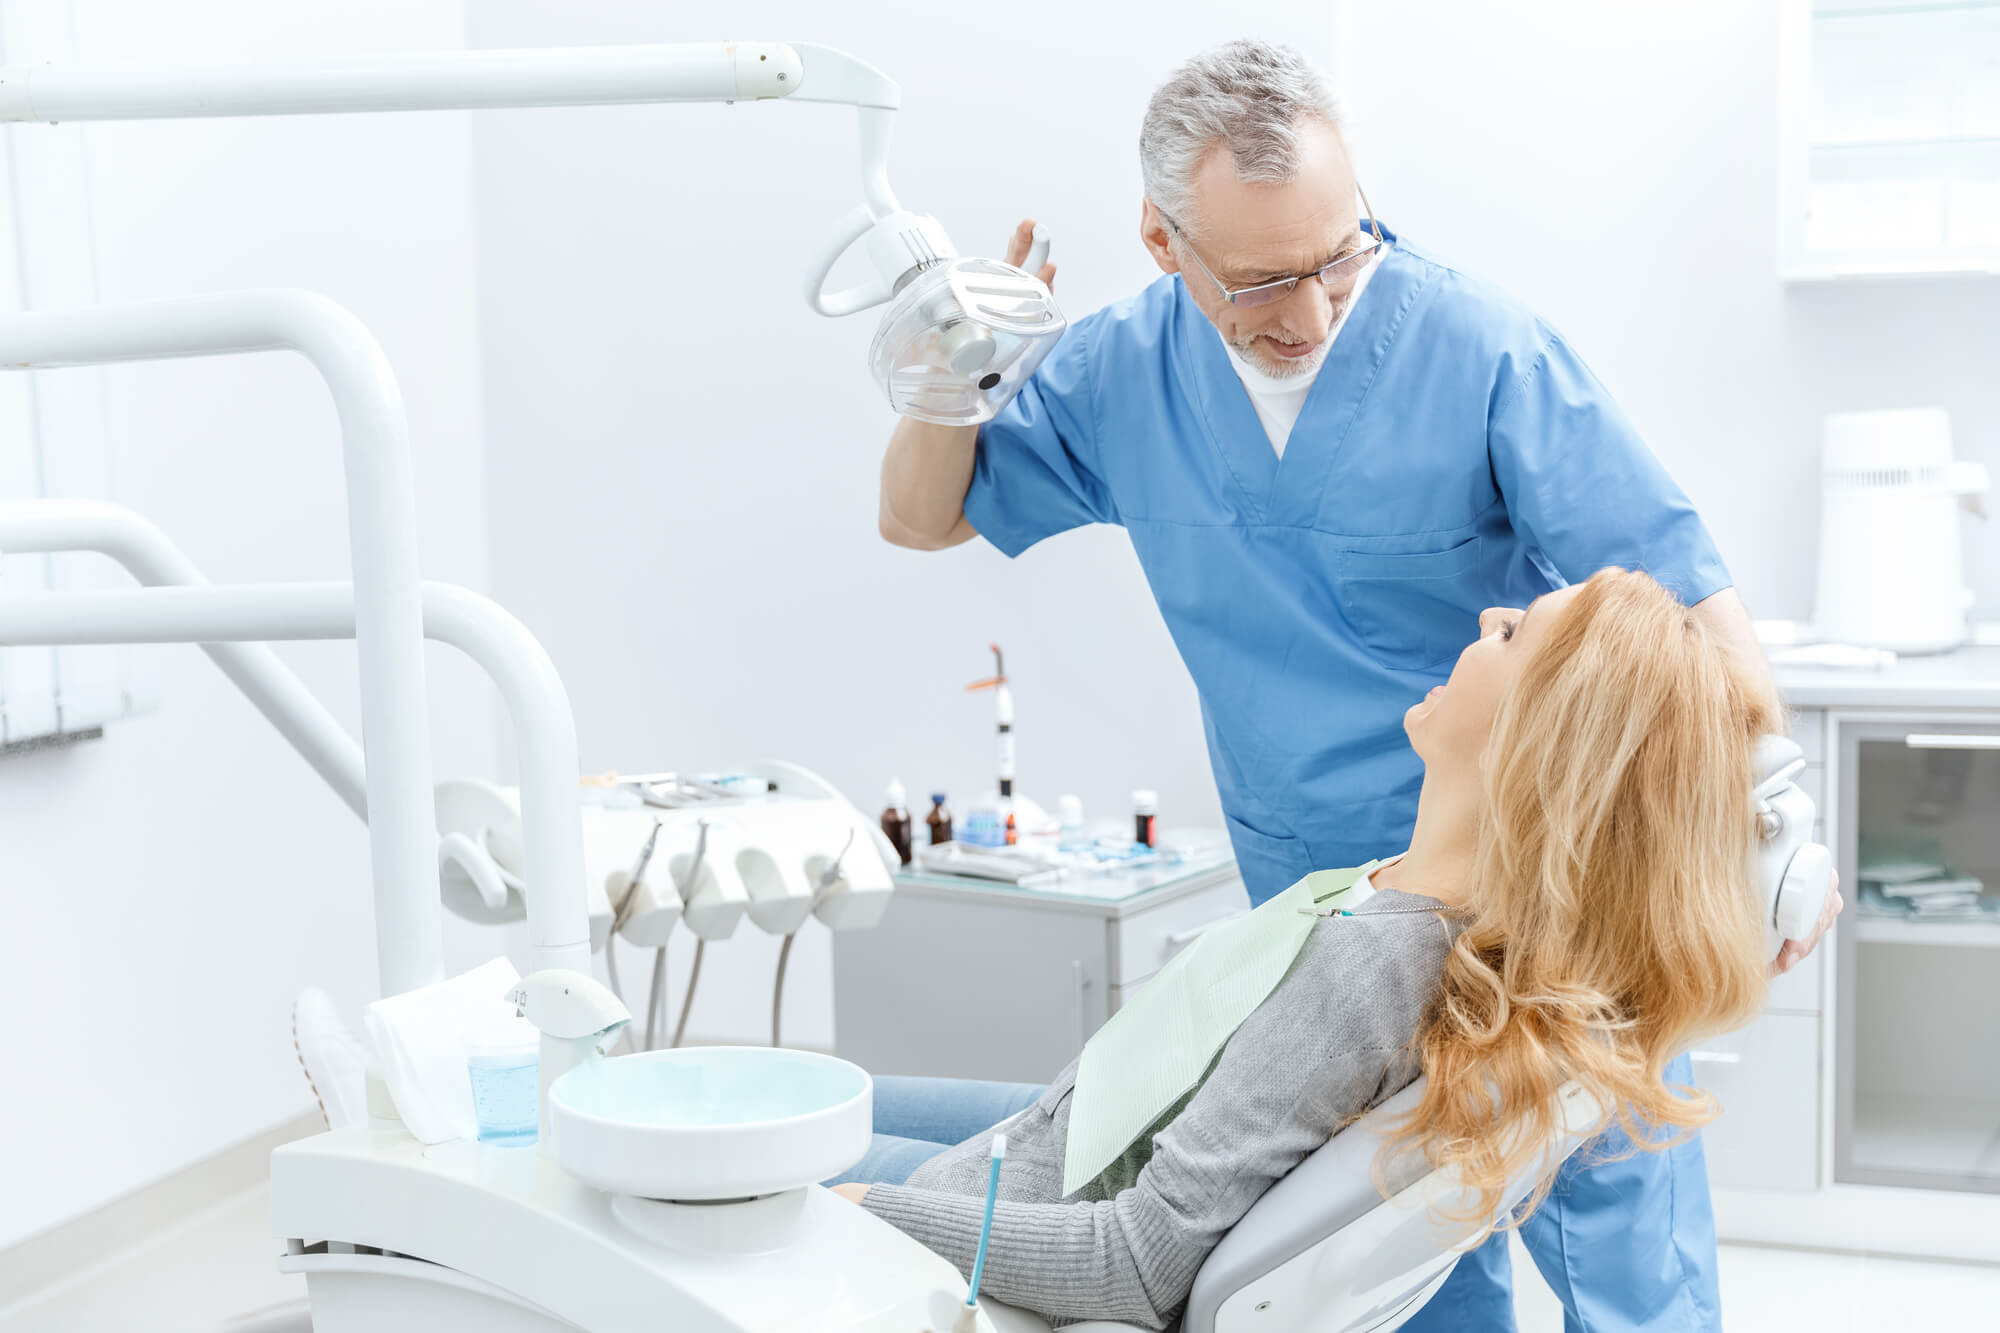 getting Ceramic Dental Implants Jupiter FL